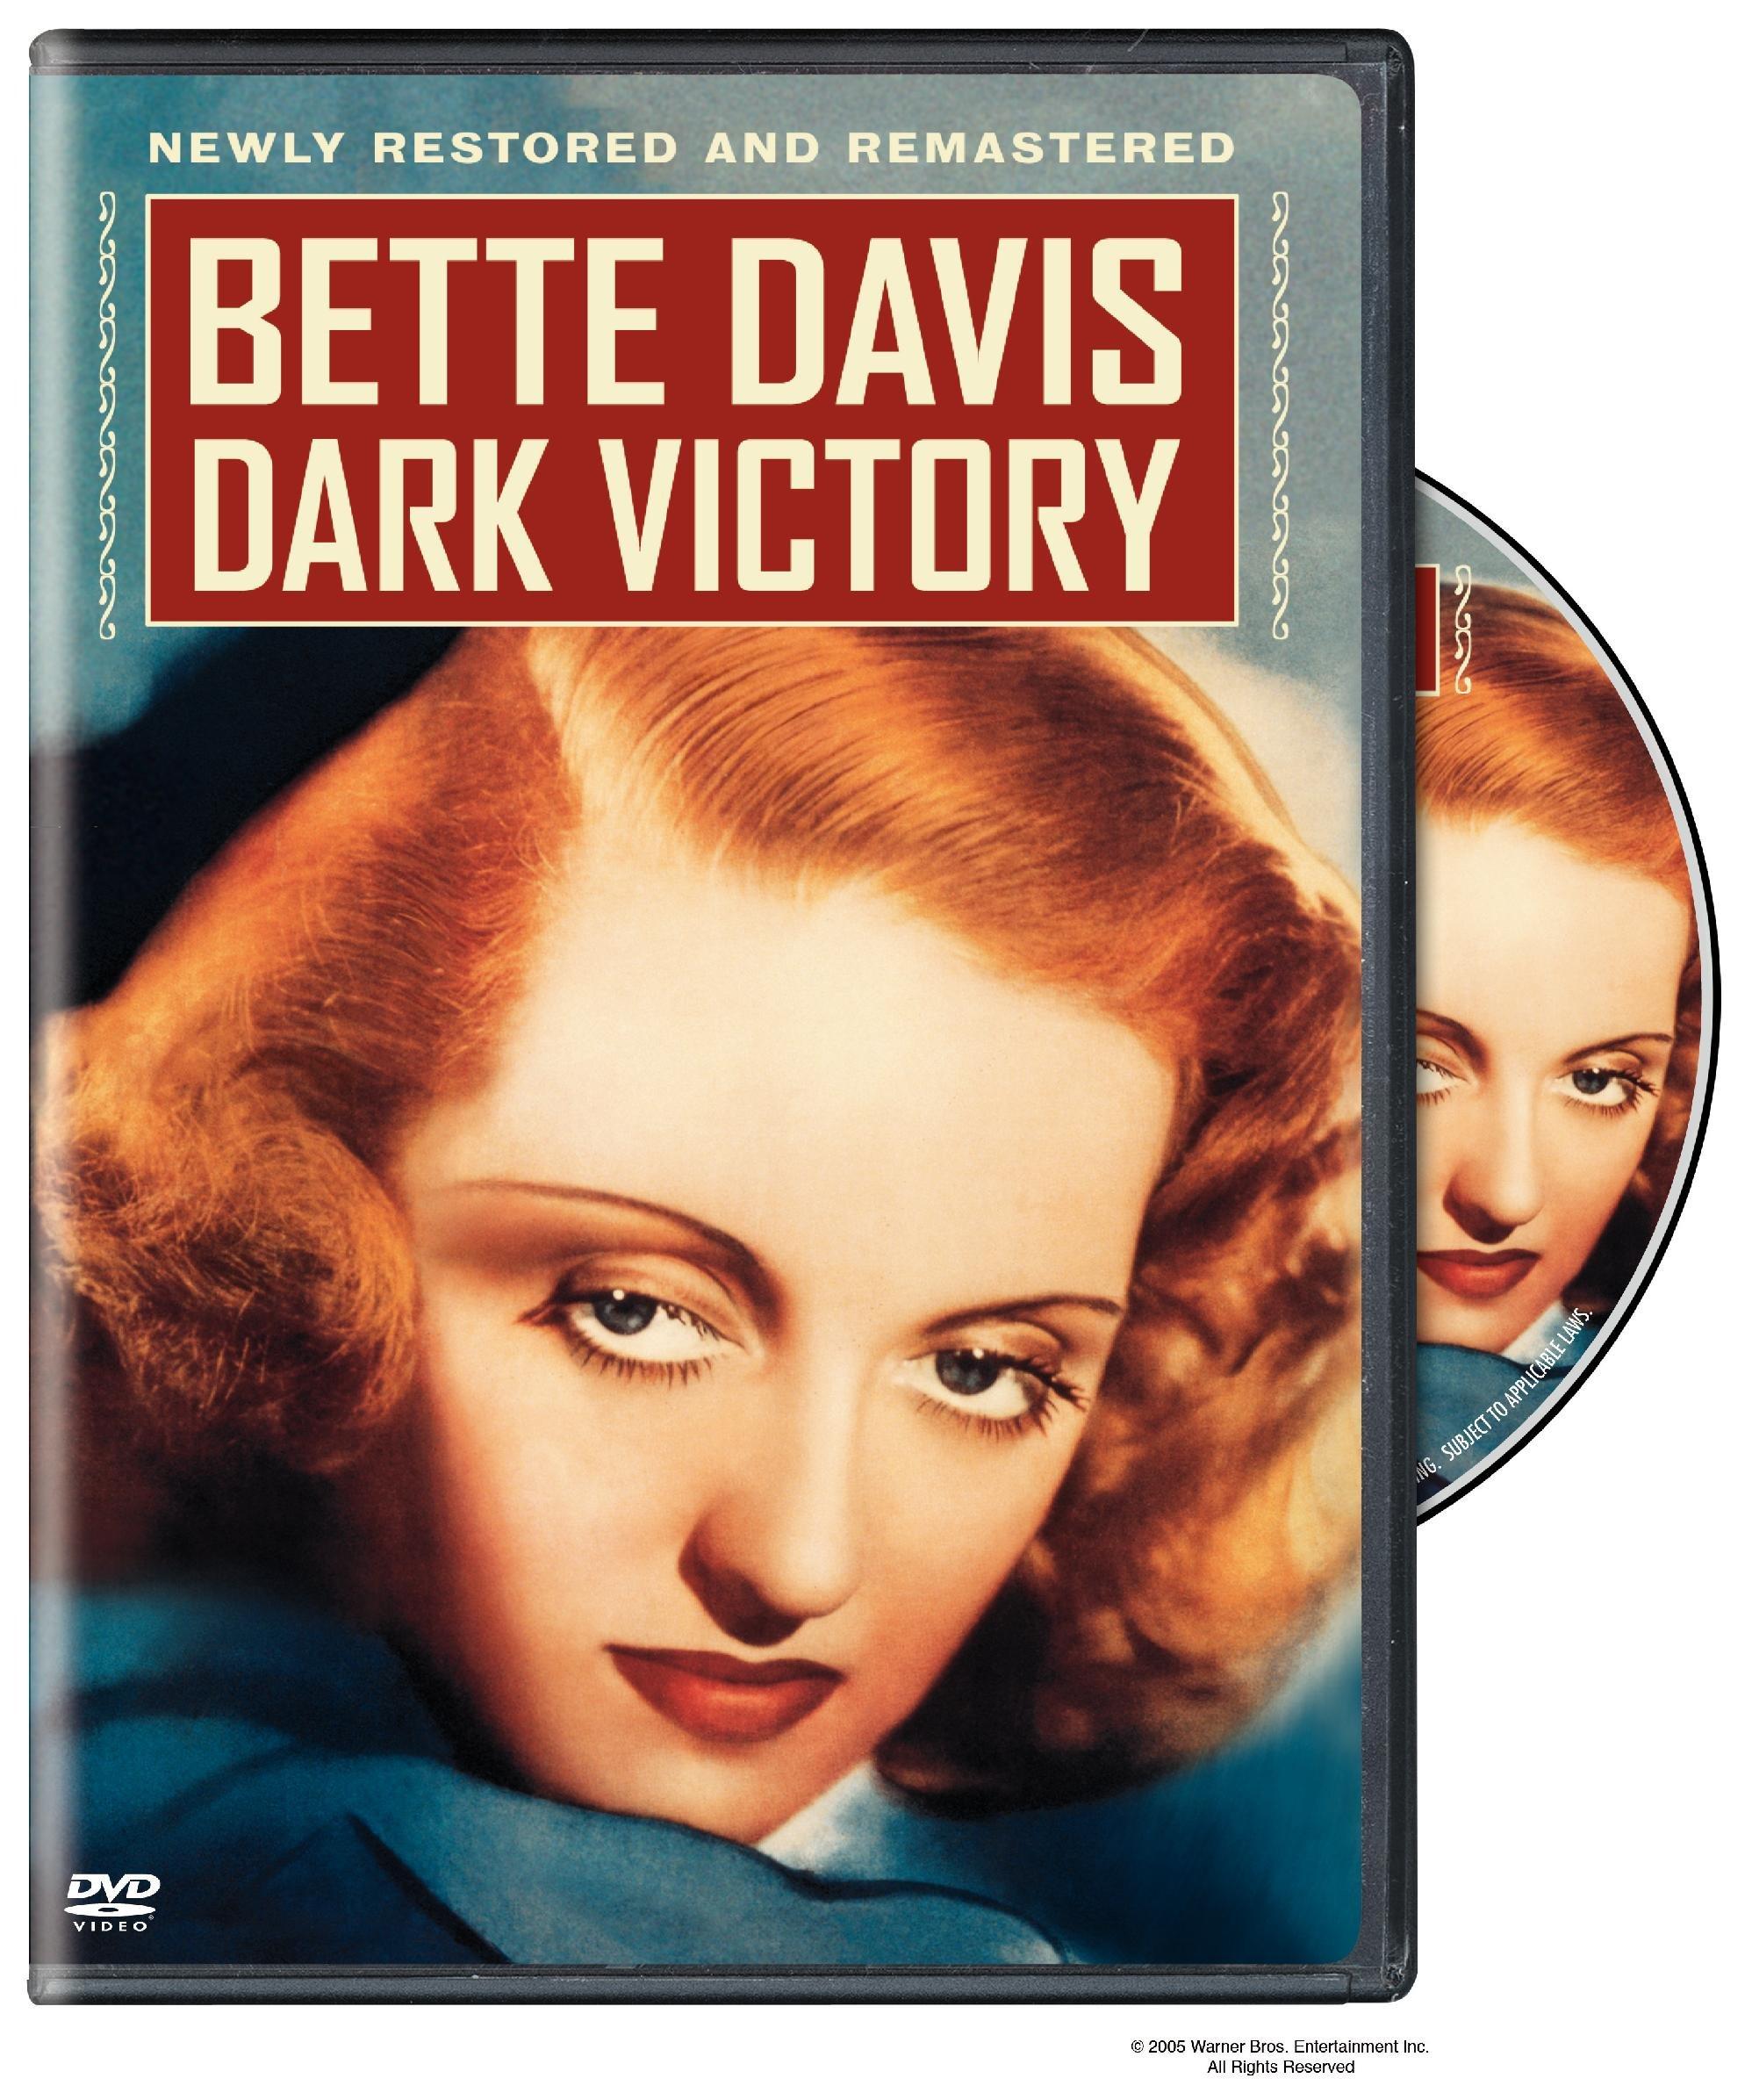 DVD : Dark Victory (Subtitled, Standard Screen)